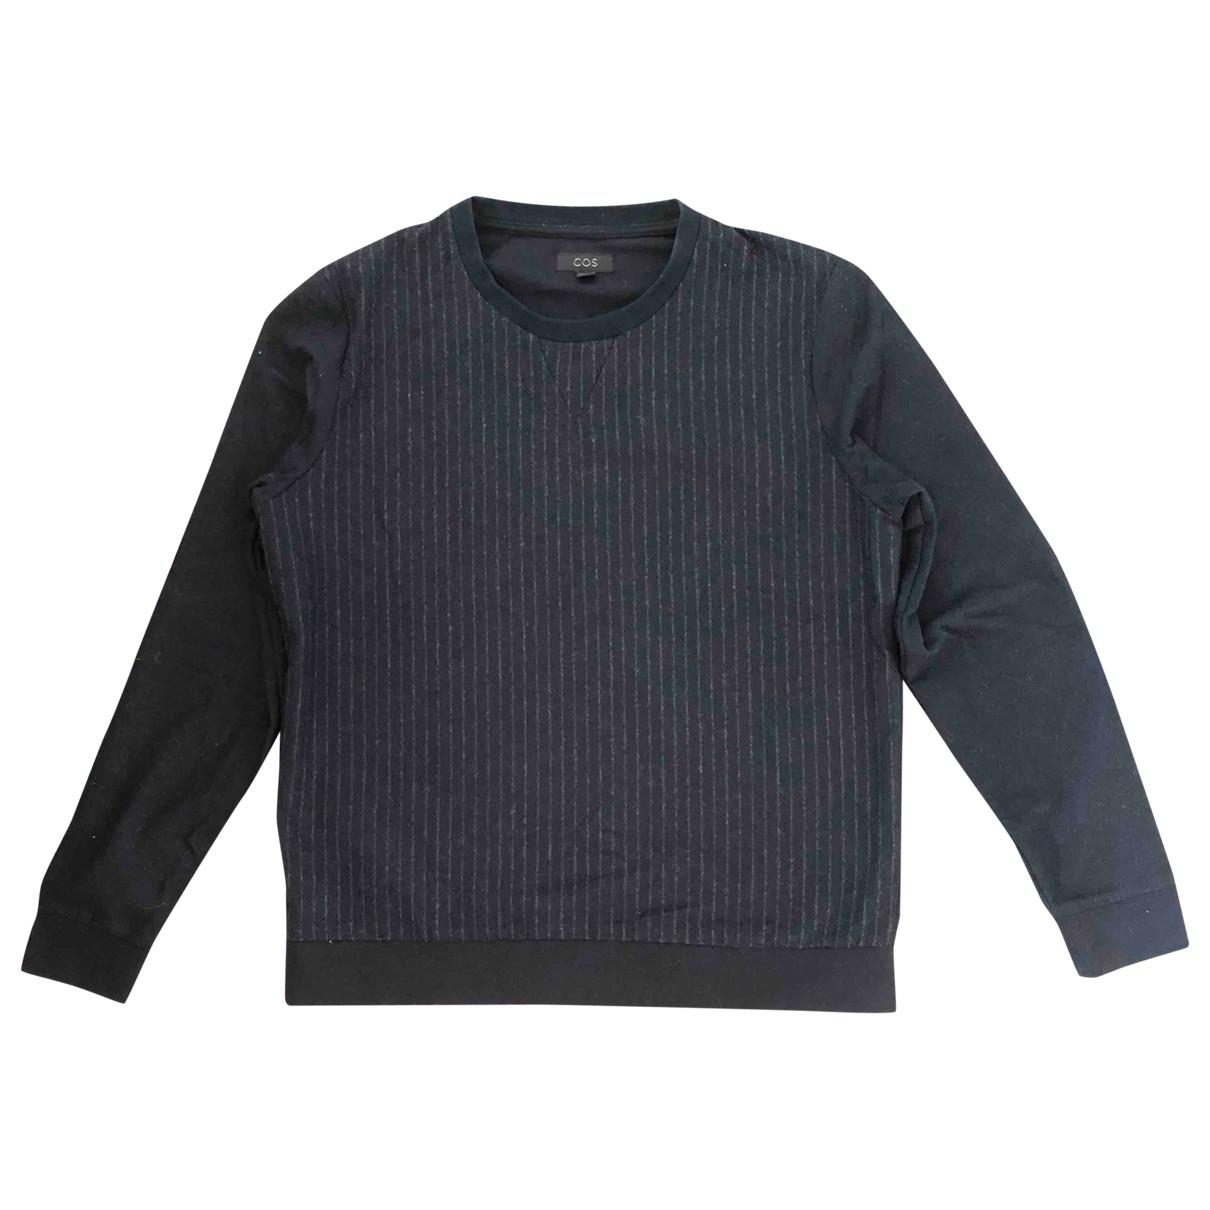 Cos \N Blue Wool Shirts for Men M International